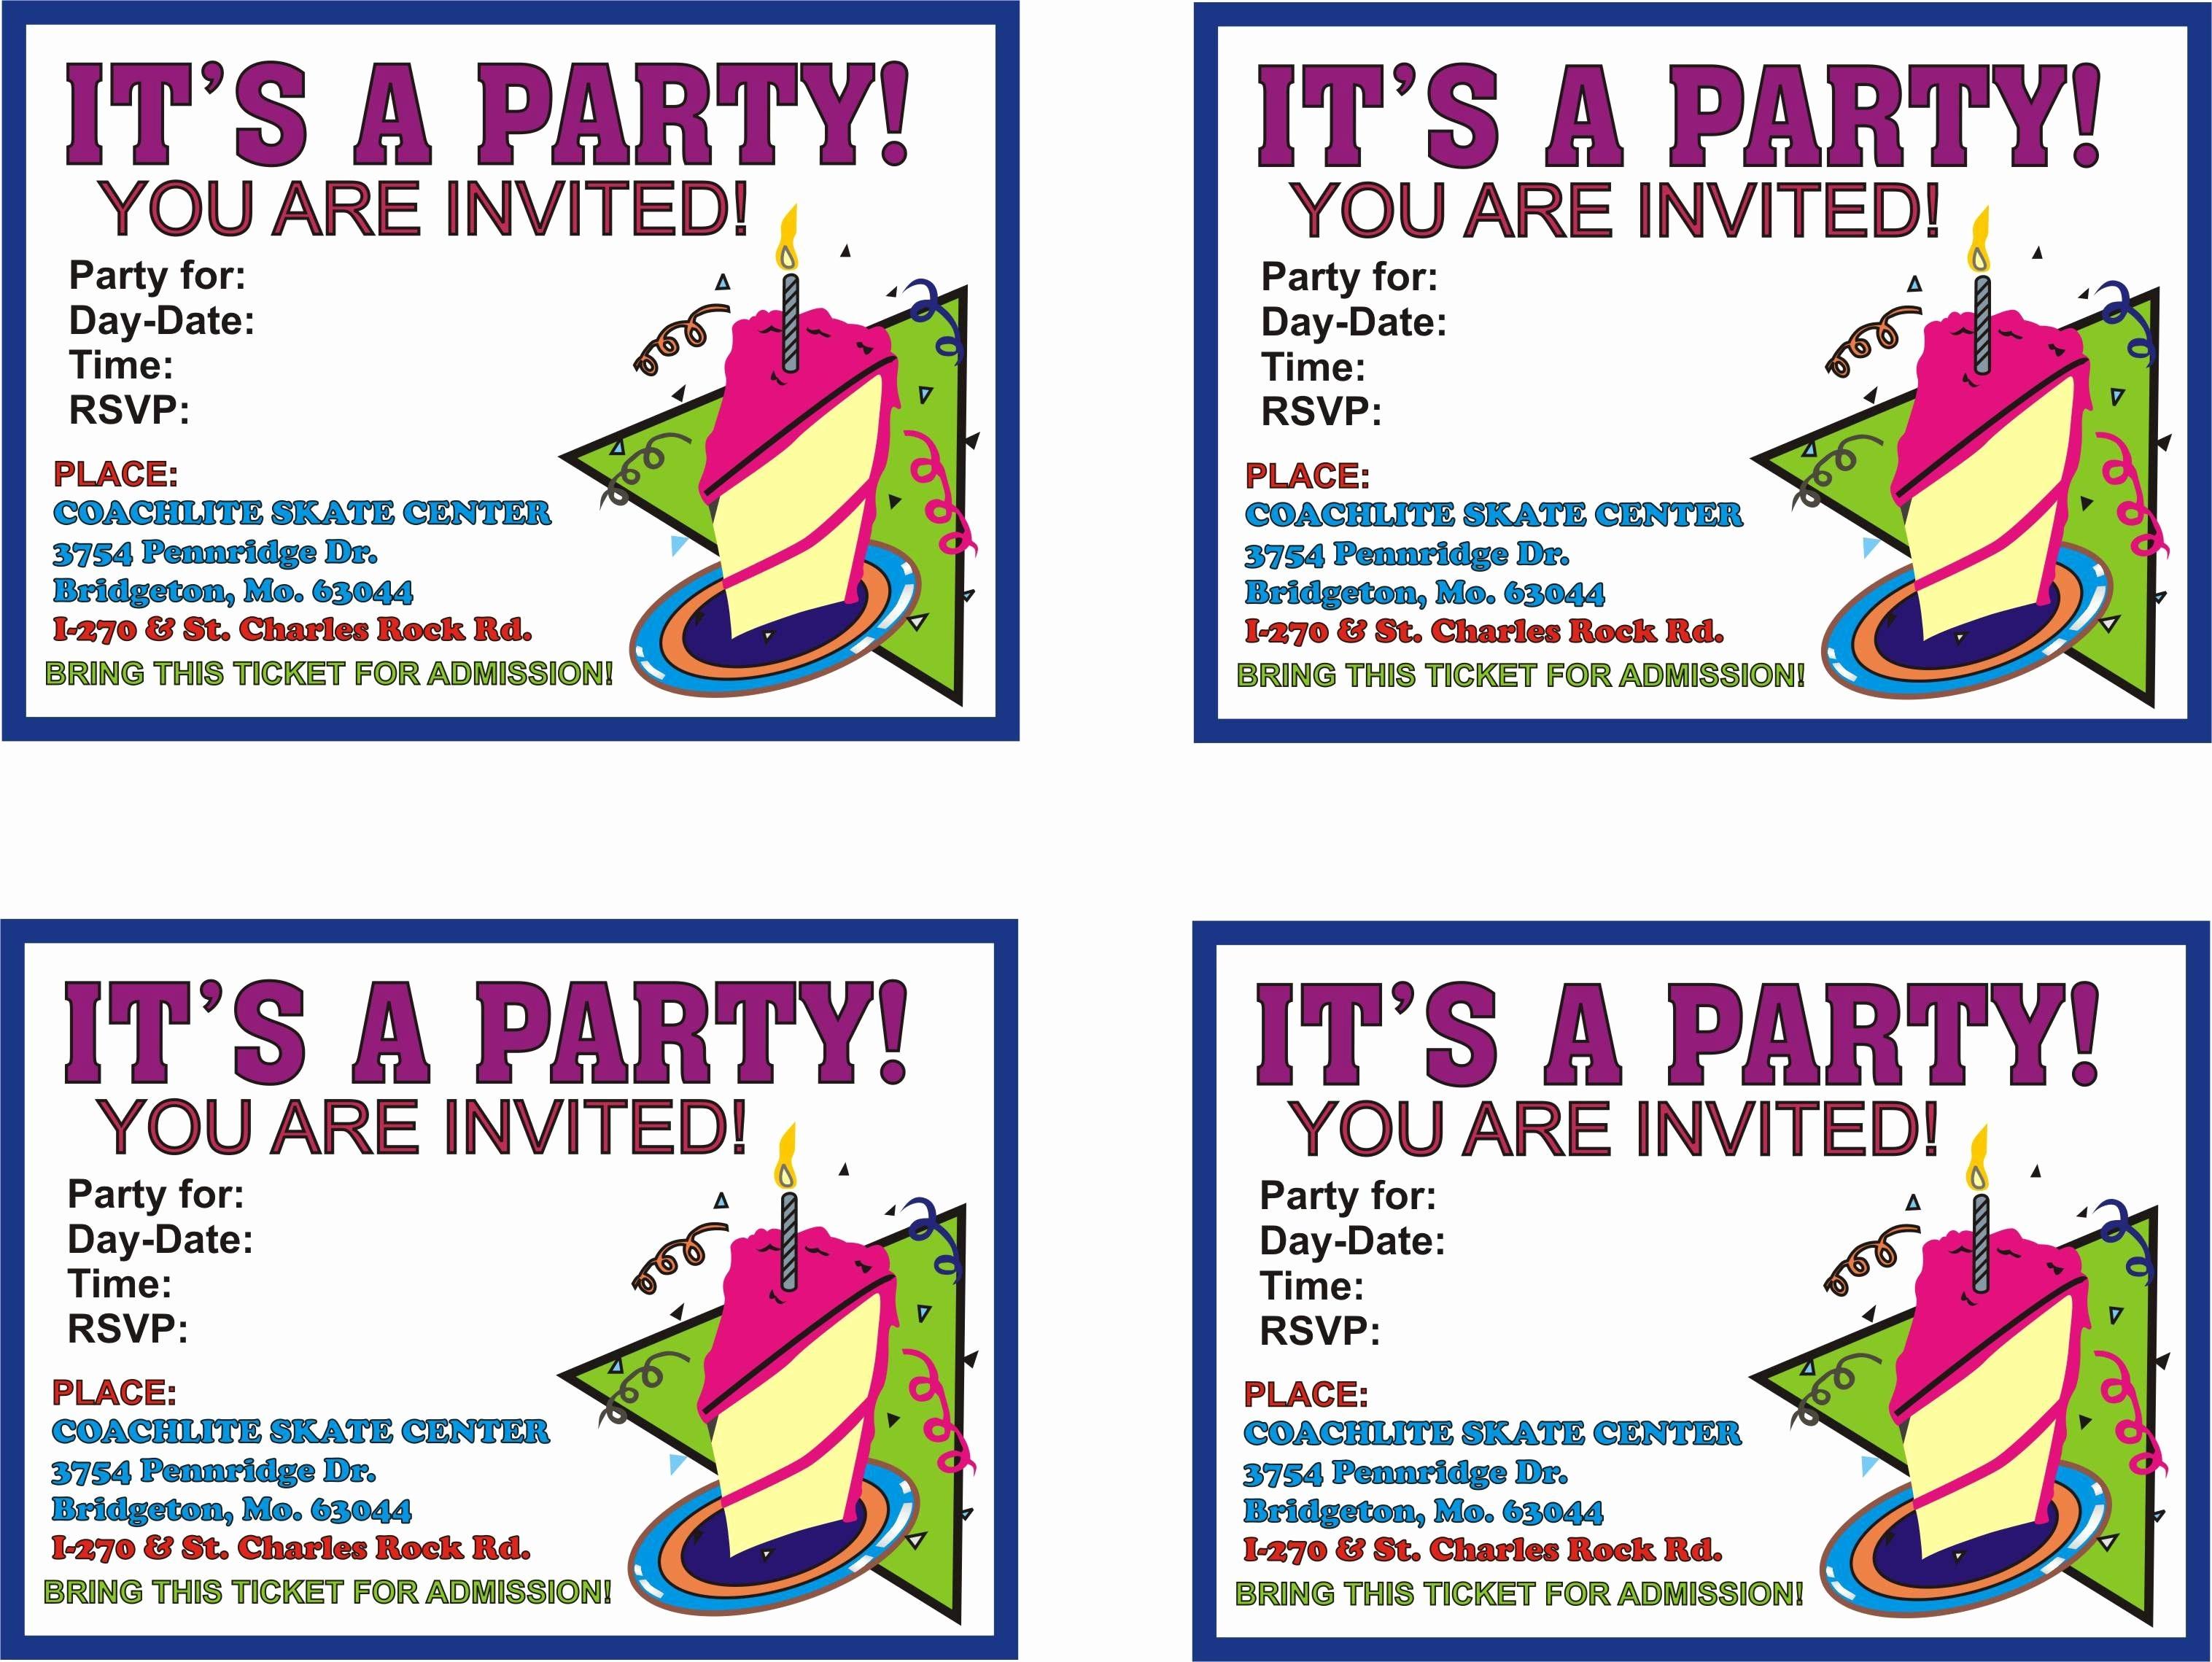 Free Printable Birthday Flyers Luxury Idea Free Birthday Flyer - Free Printable Birthday Party Flyers